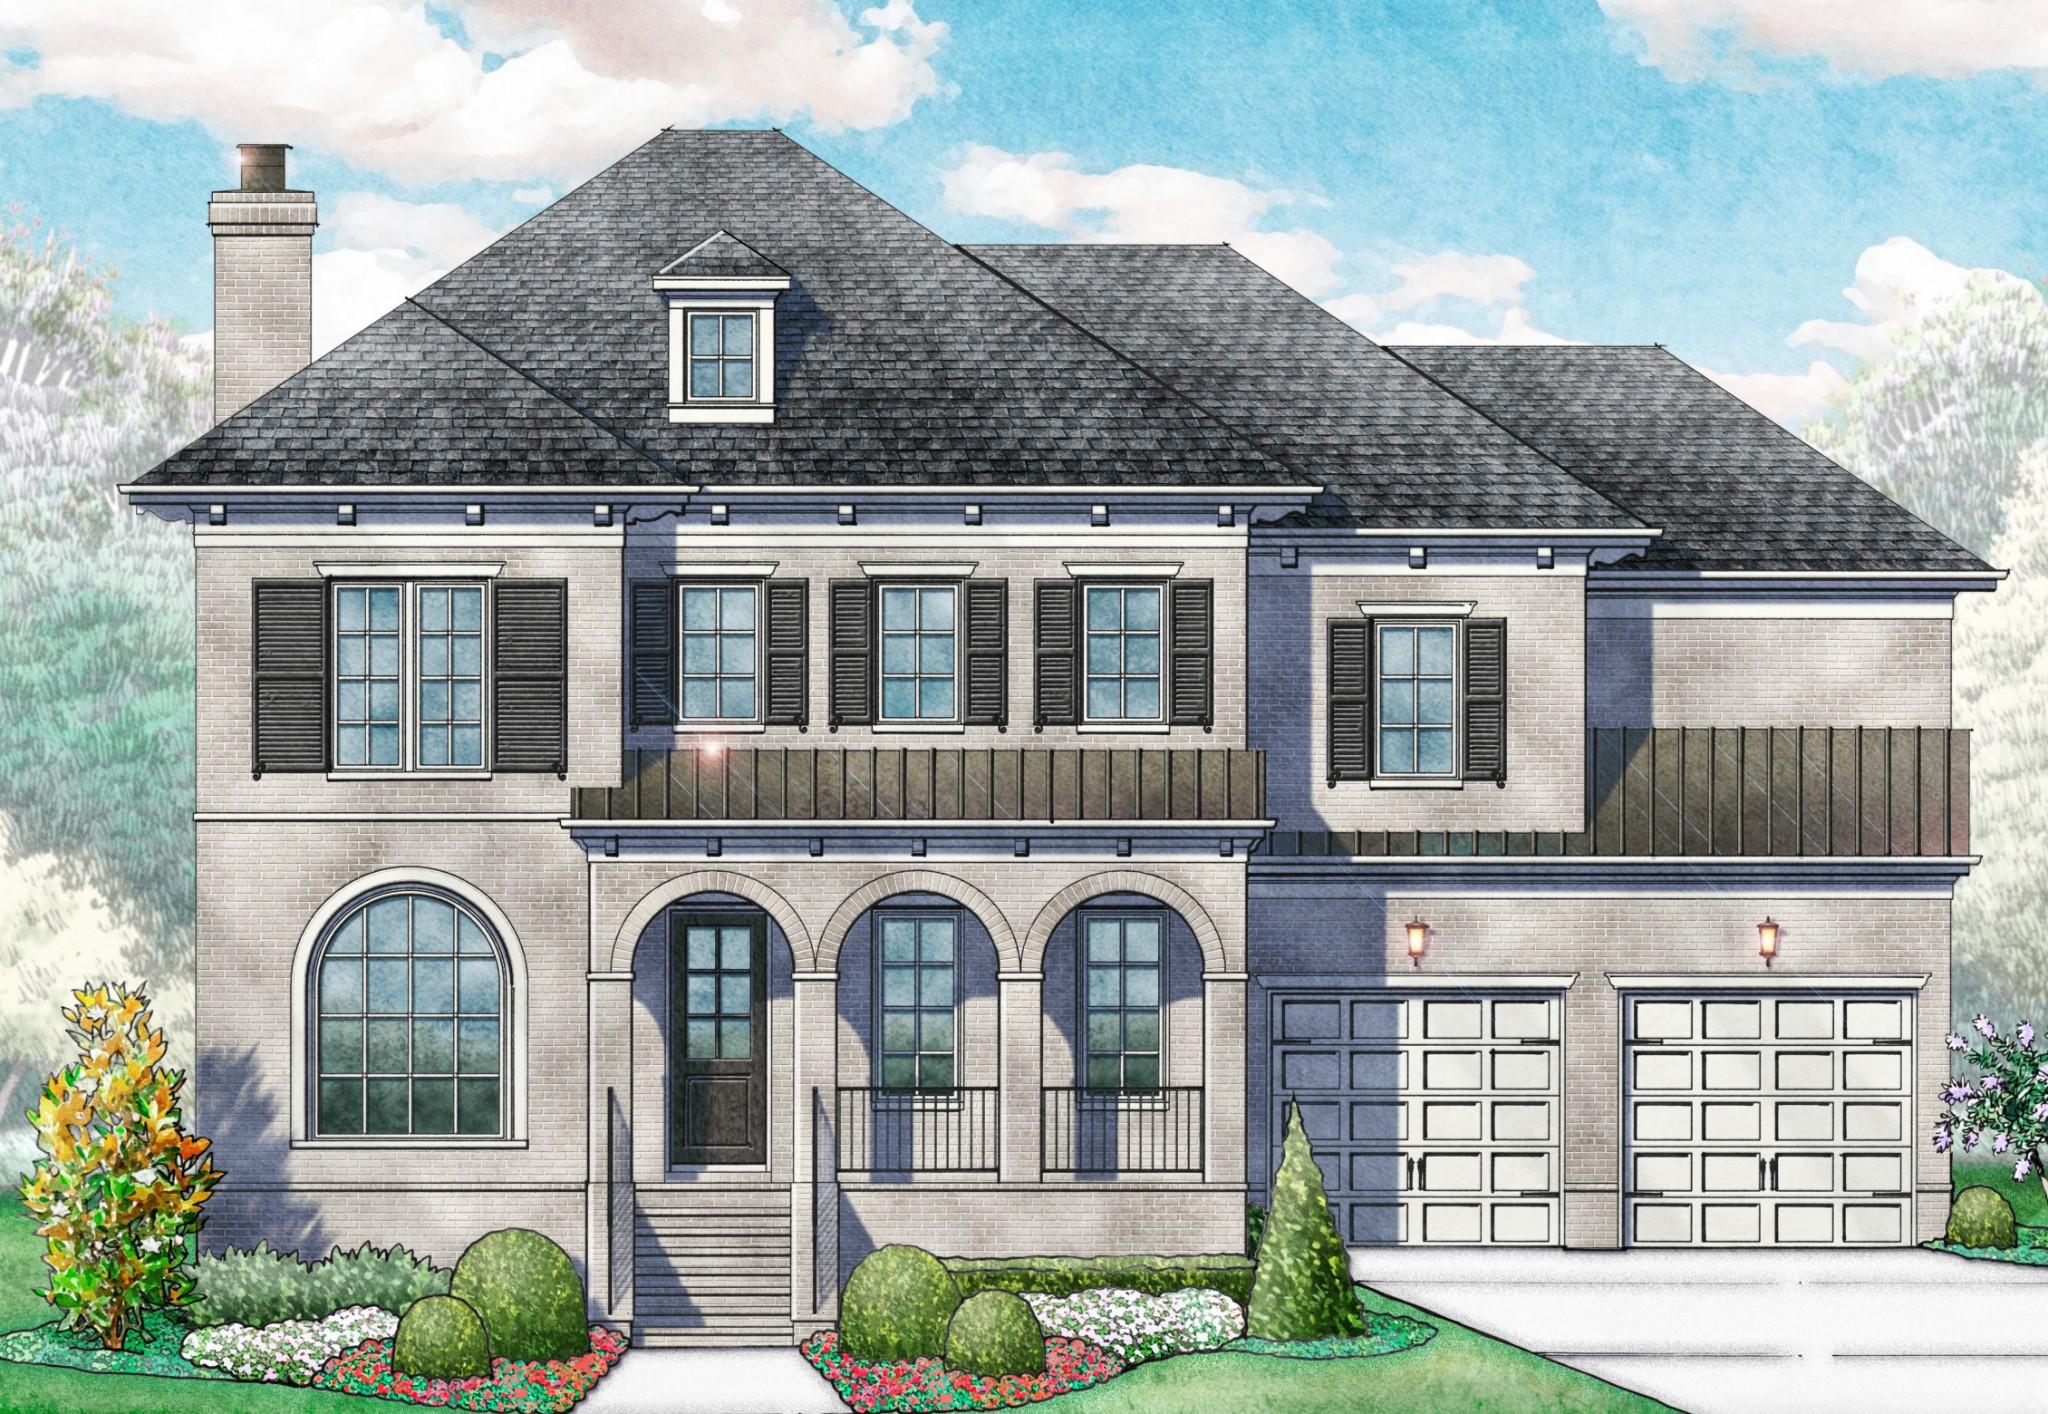 901 Cheltenham Ave, Lot # 2144 Property Photo - Franklin, TN real estate listing